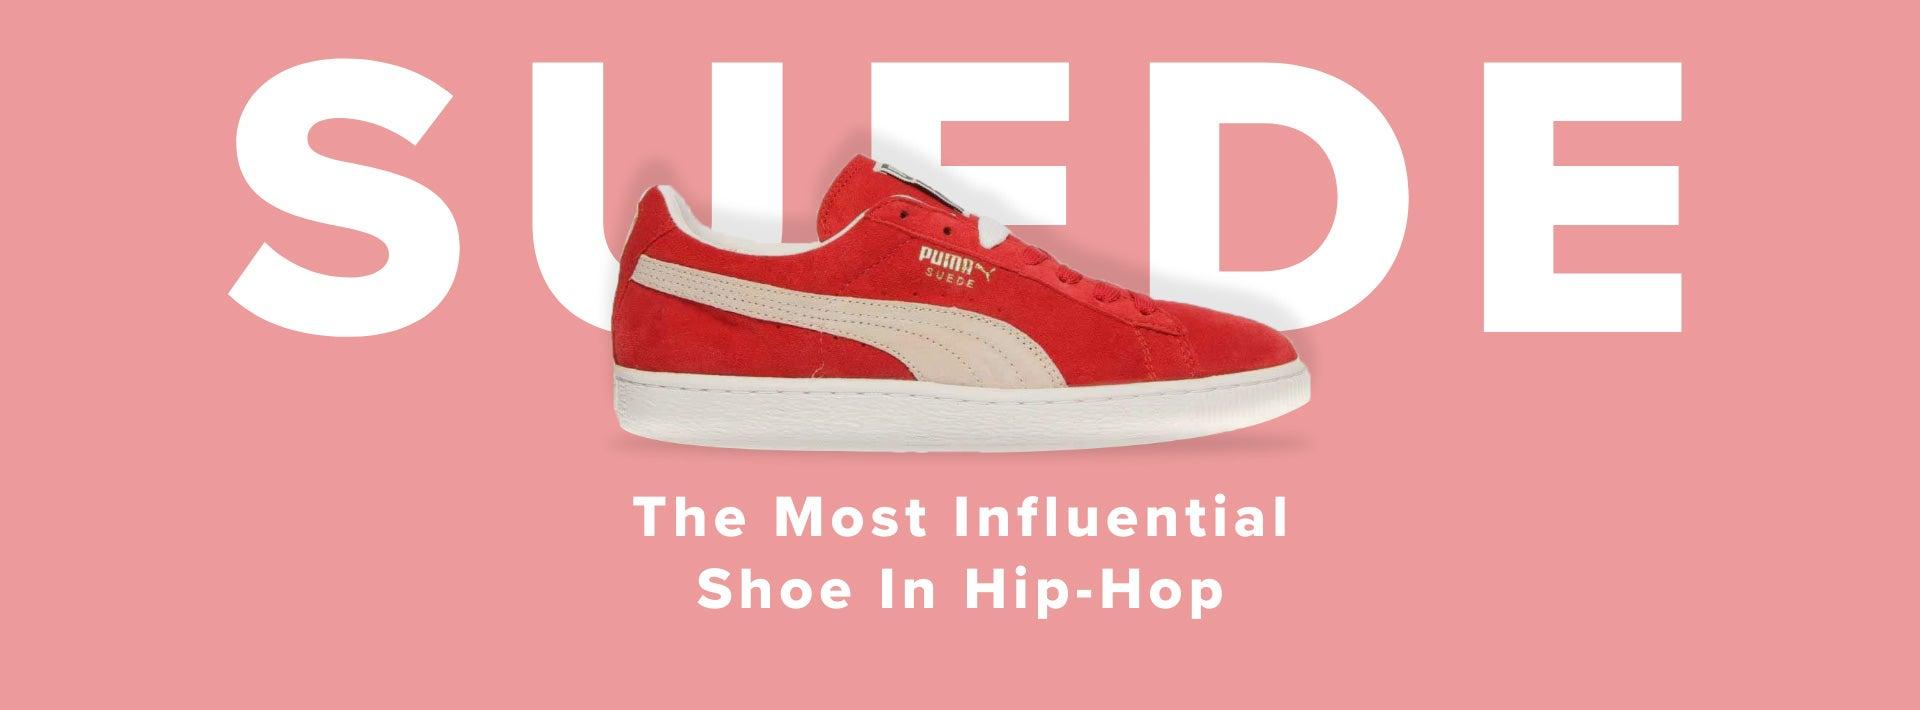 Puma Suede Classic Shoes For Men & Women Black, Red & Blue